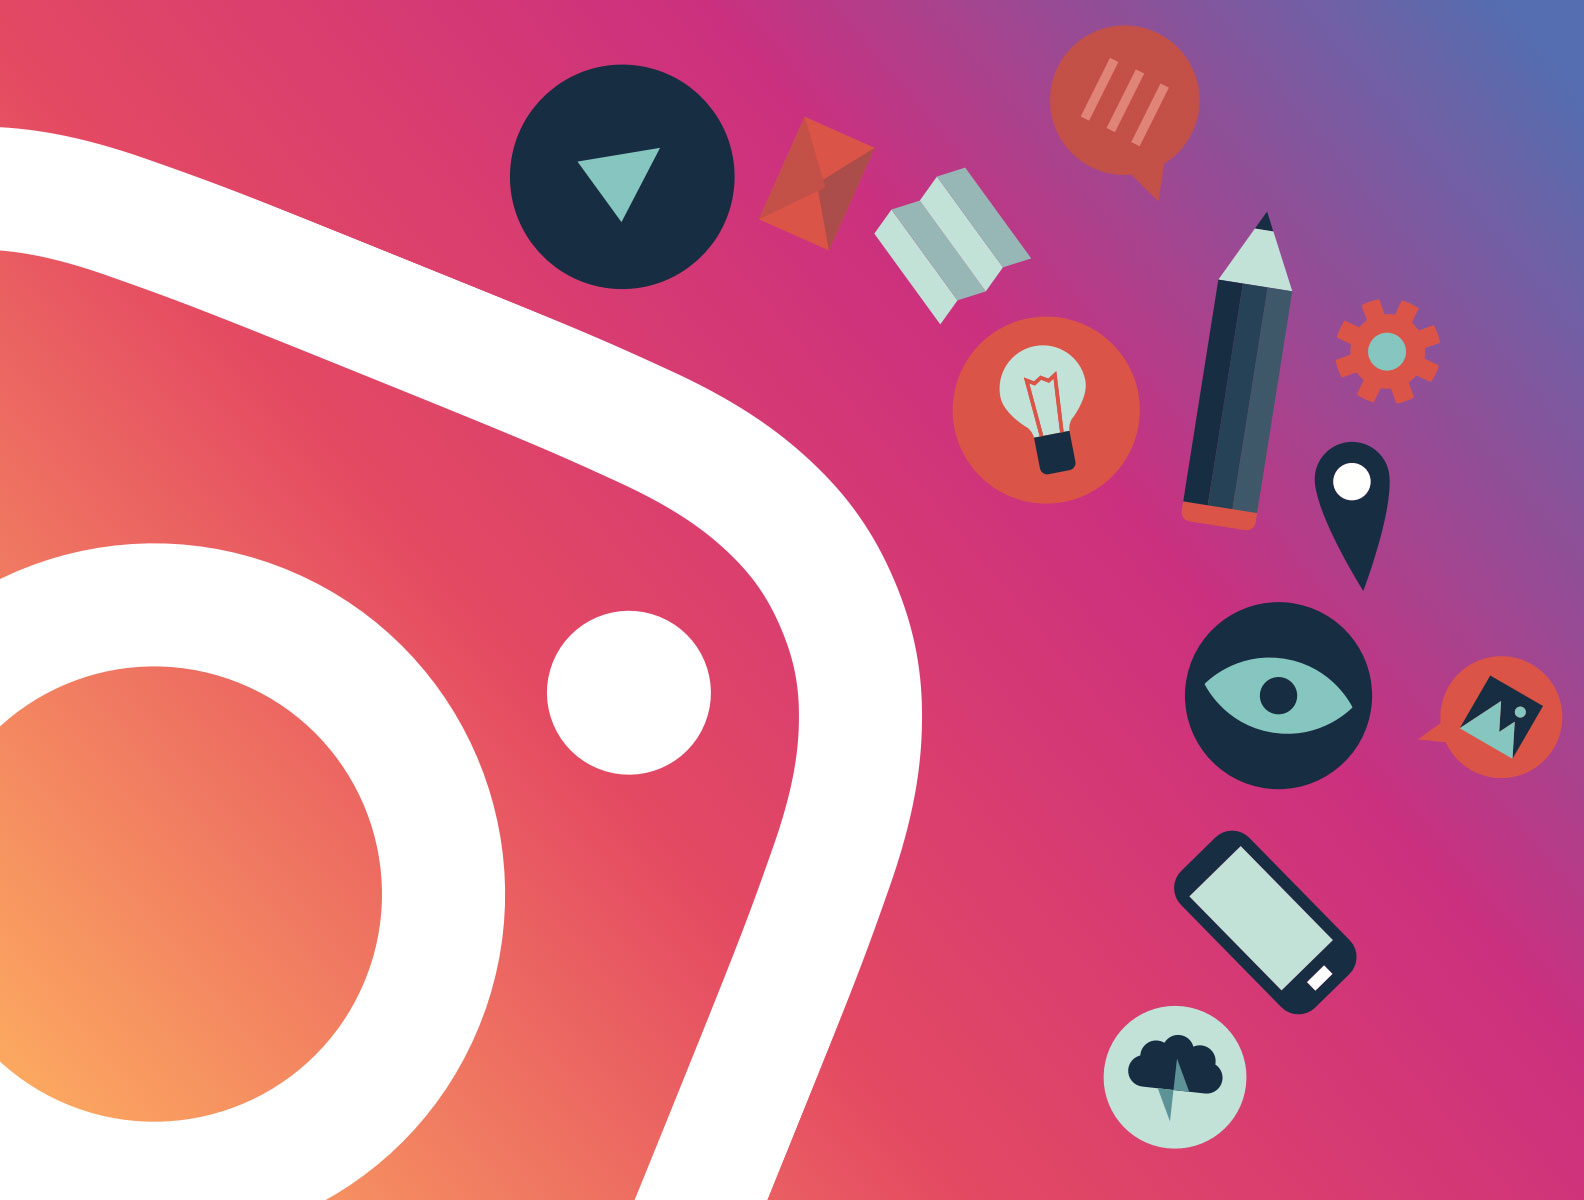 30 Ideias De Posts Para Instagram Fantásticas Apptuts